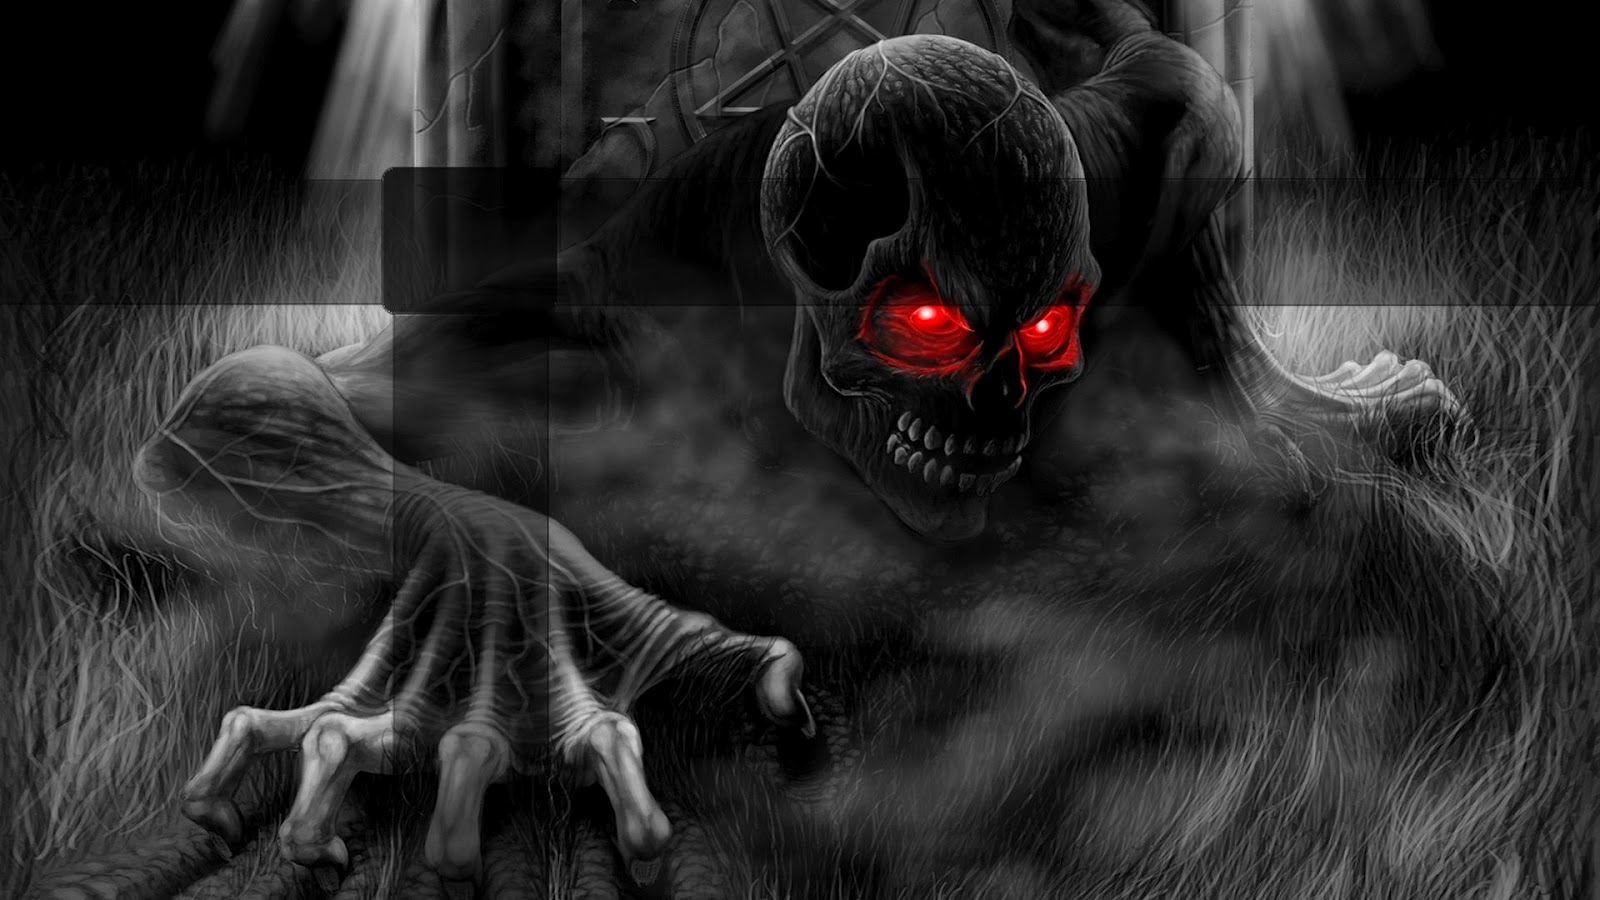 http://3.bp.blogspot.com/-GRoEMxZ2BgM/T3xwXduTX4I/AAAAAAAAAtE/c47mbip7ZWg/s1600/hd_wallpaper+skeleton.jpg